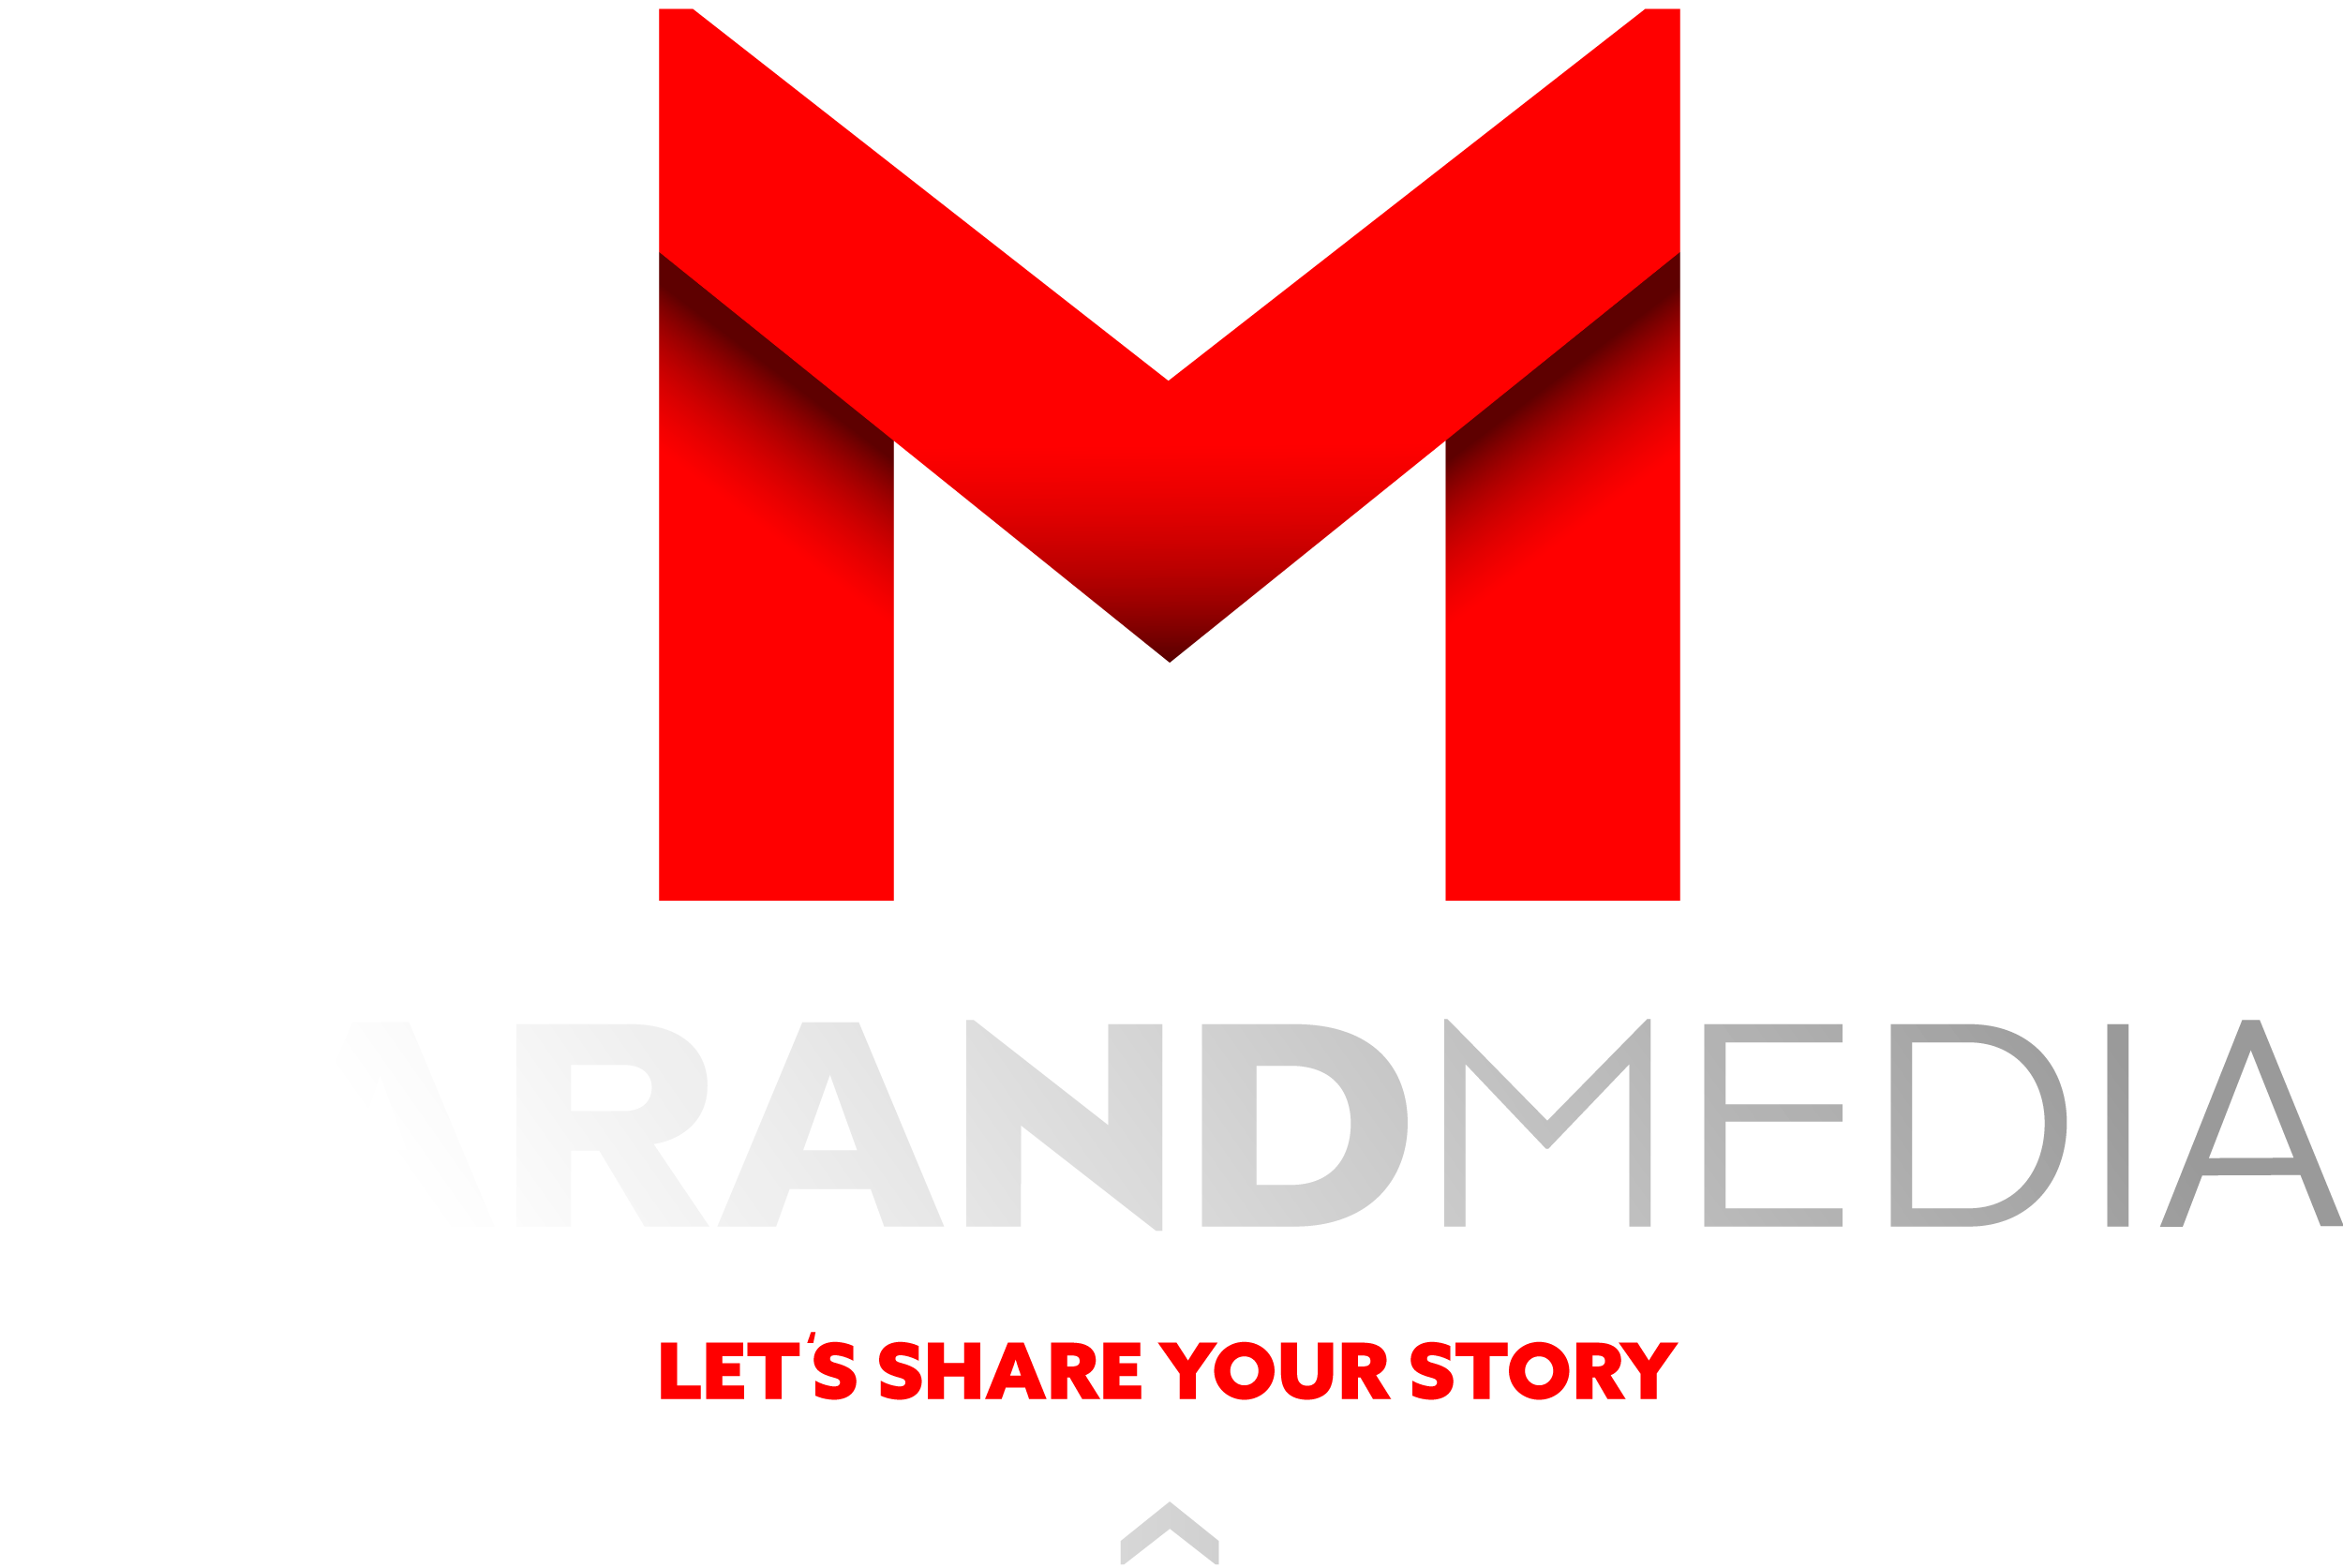 MM-Logo-NEW-light-background-v3.png